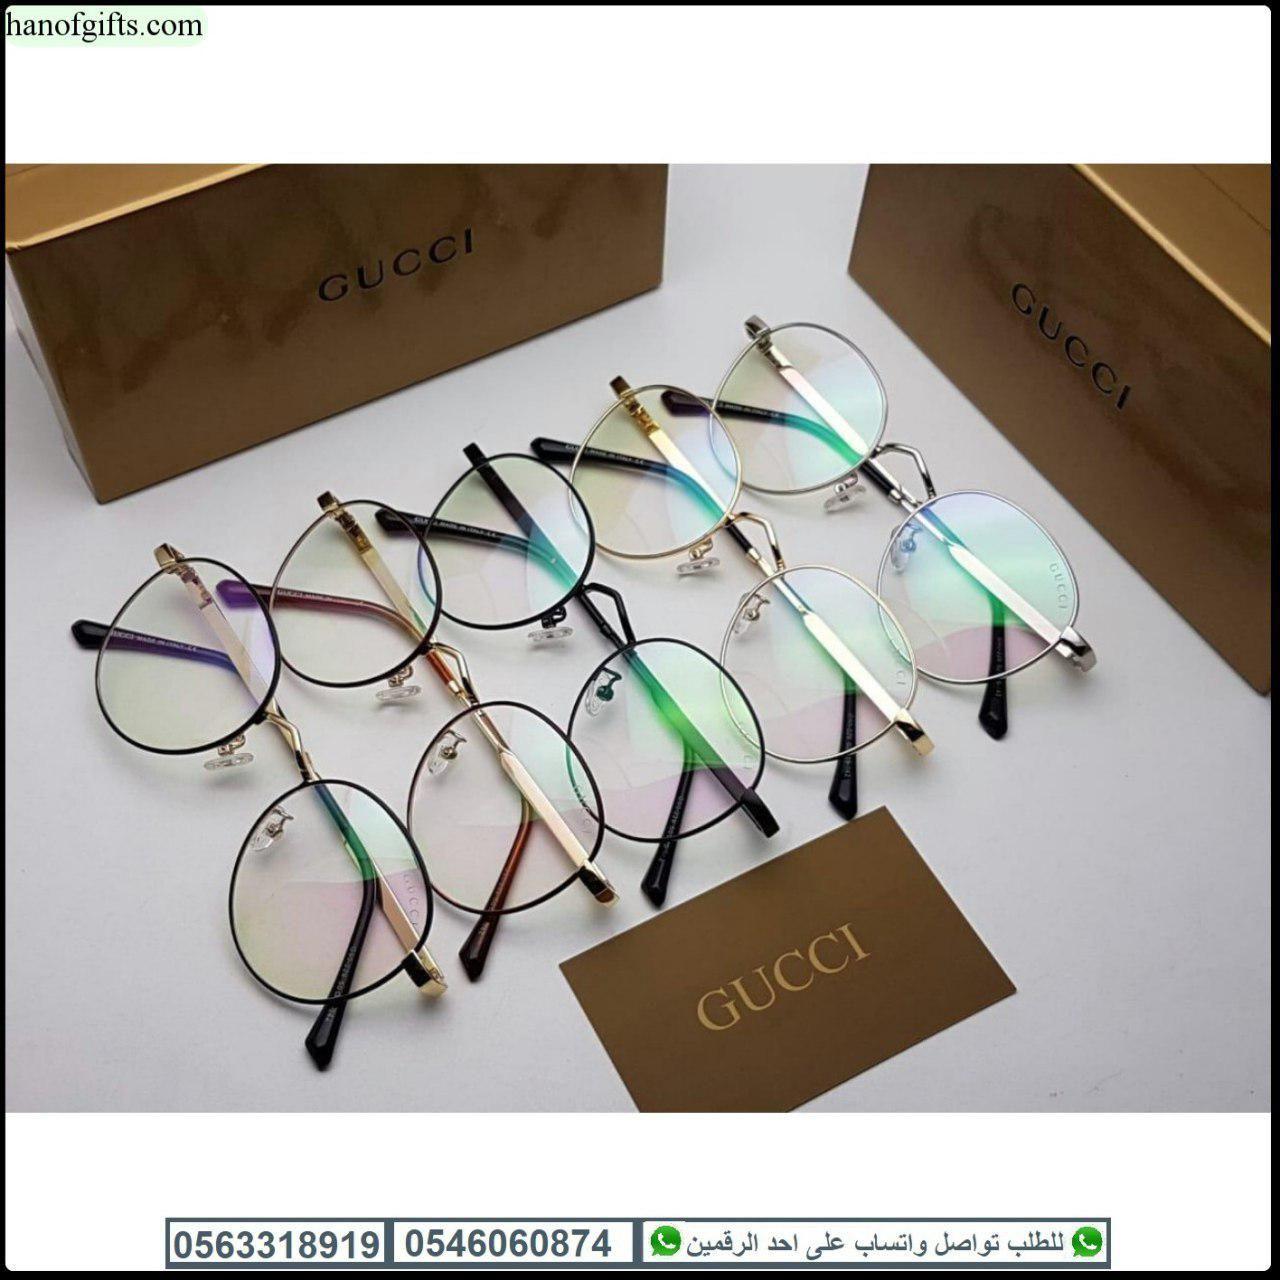 نظارات قوتشي رجالي Gucci مع جميع الملحقات و بنفس اسم الماركه هدايا هنوف Glasses Glass Round Glass